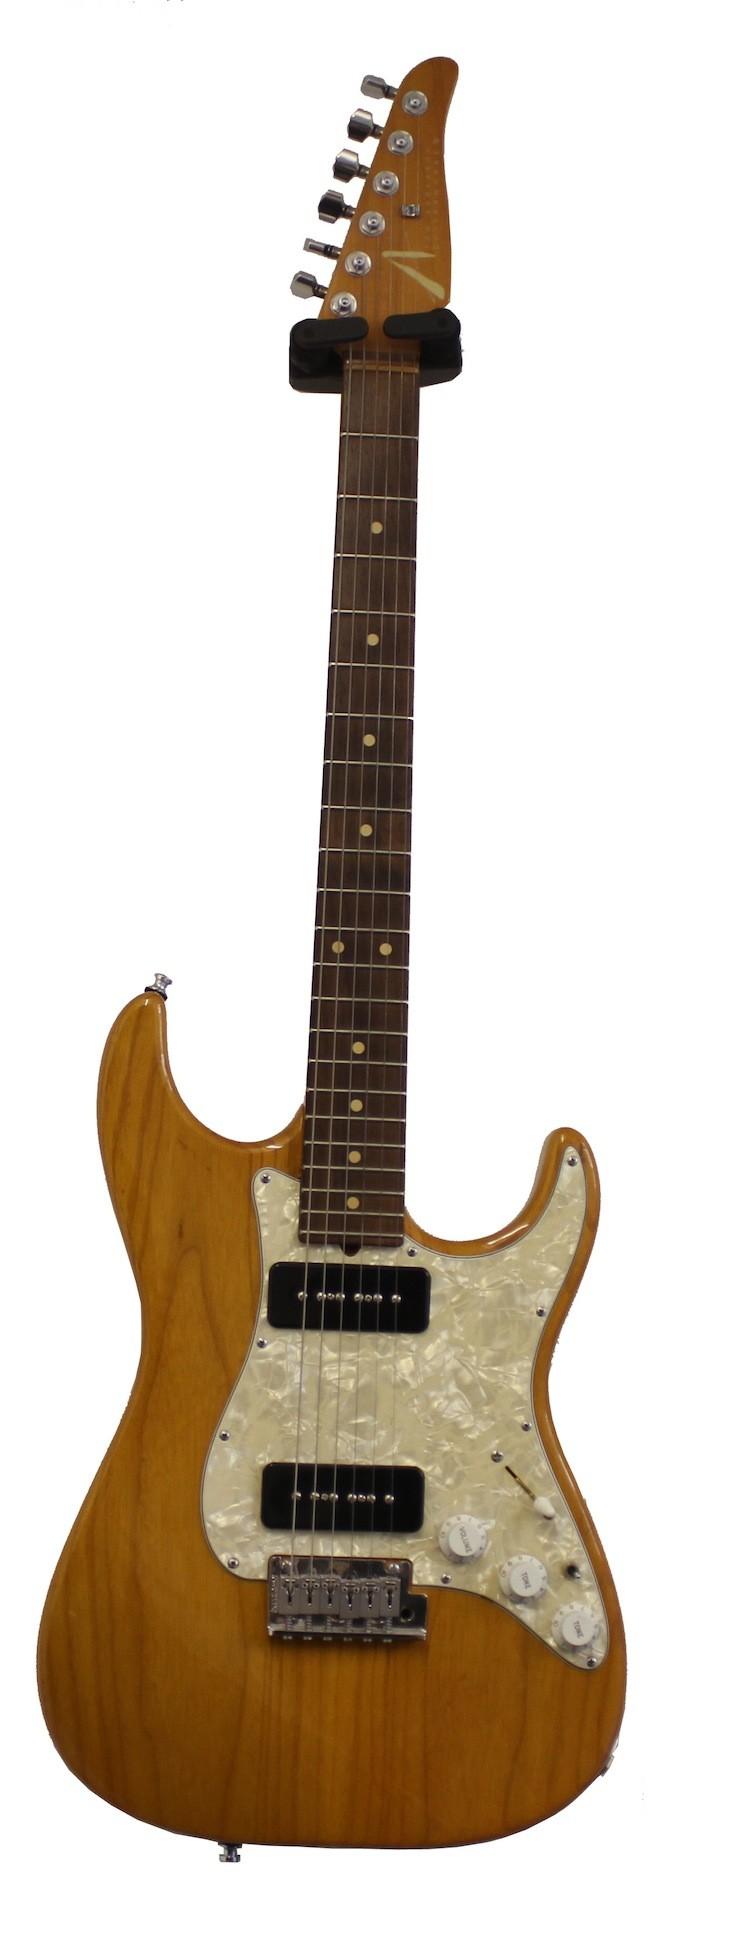 tom anderson lindy fralin p90 39 s 2000 39 s guitar for sale charlie chandler 39 s guitar experience. Black Bedroom Furniture Sets. Home Design Ideas